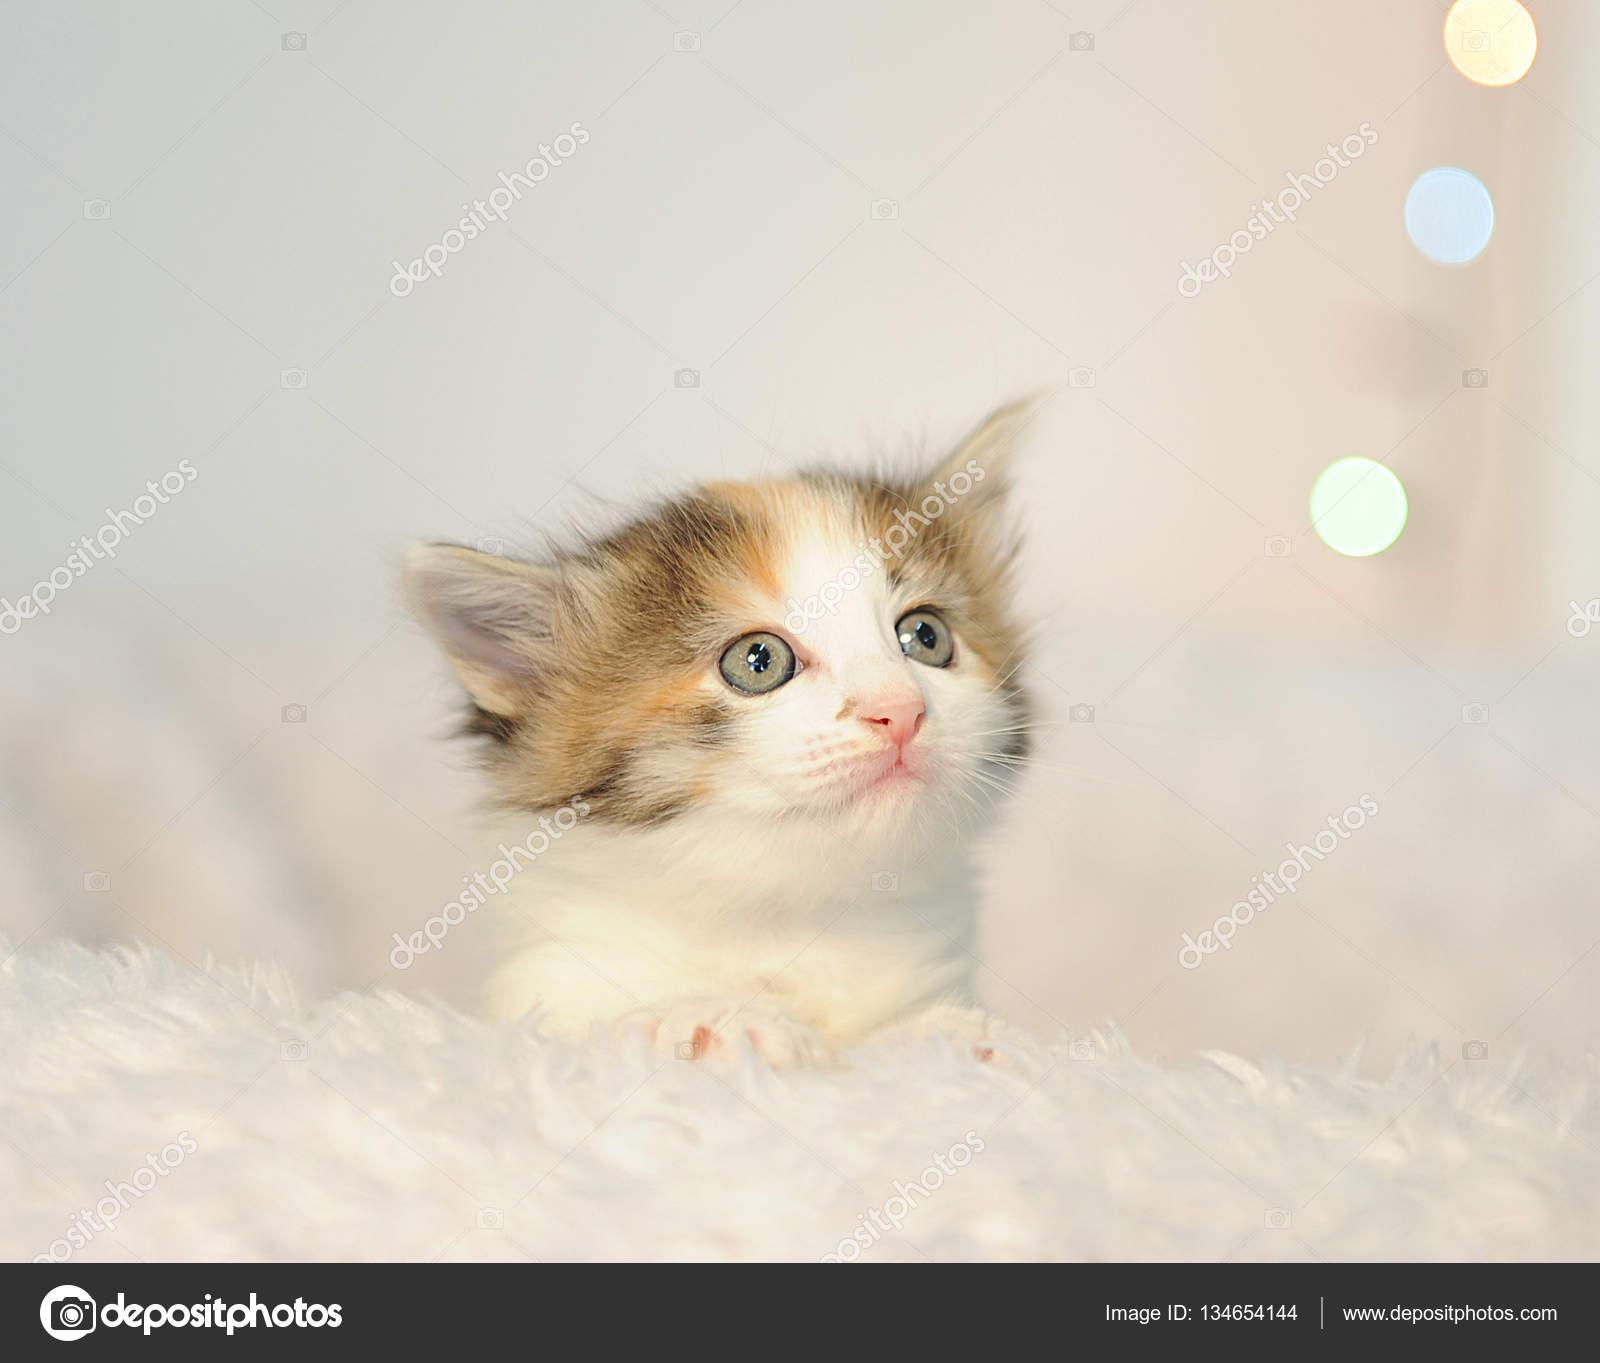 Little cute kitten peeking out of a white fluffy chair Christmas